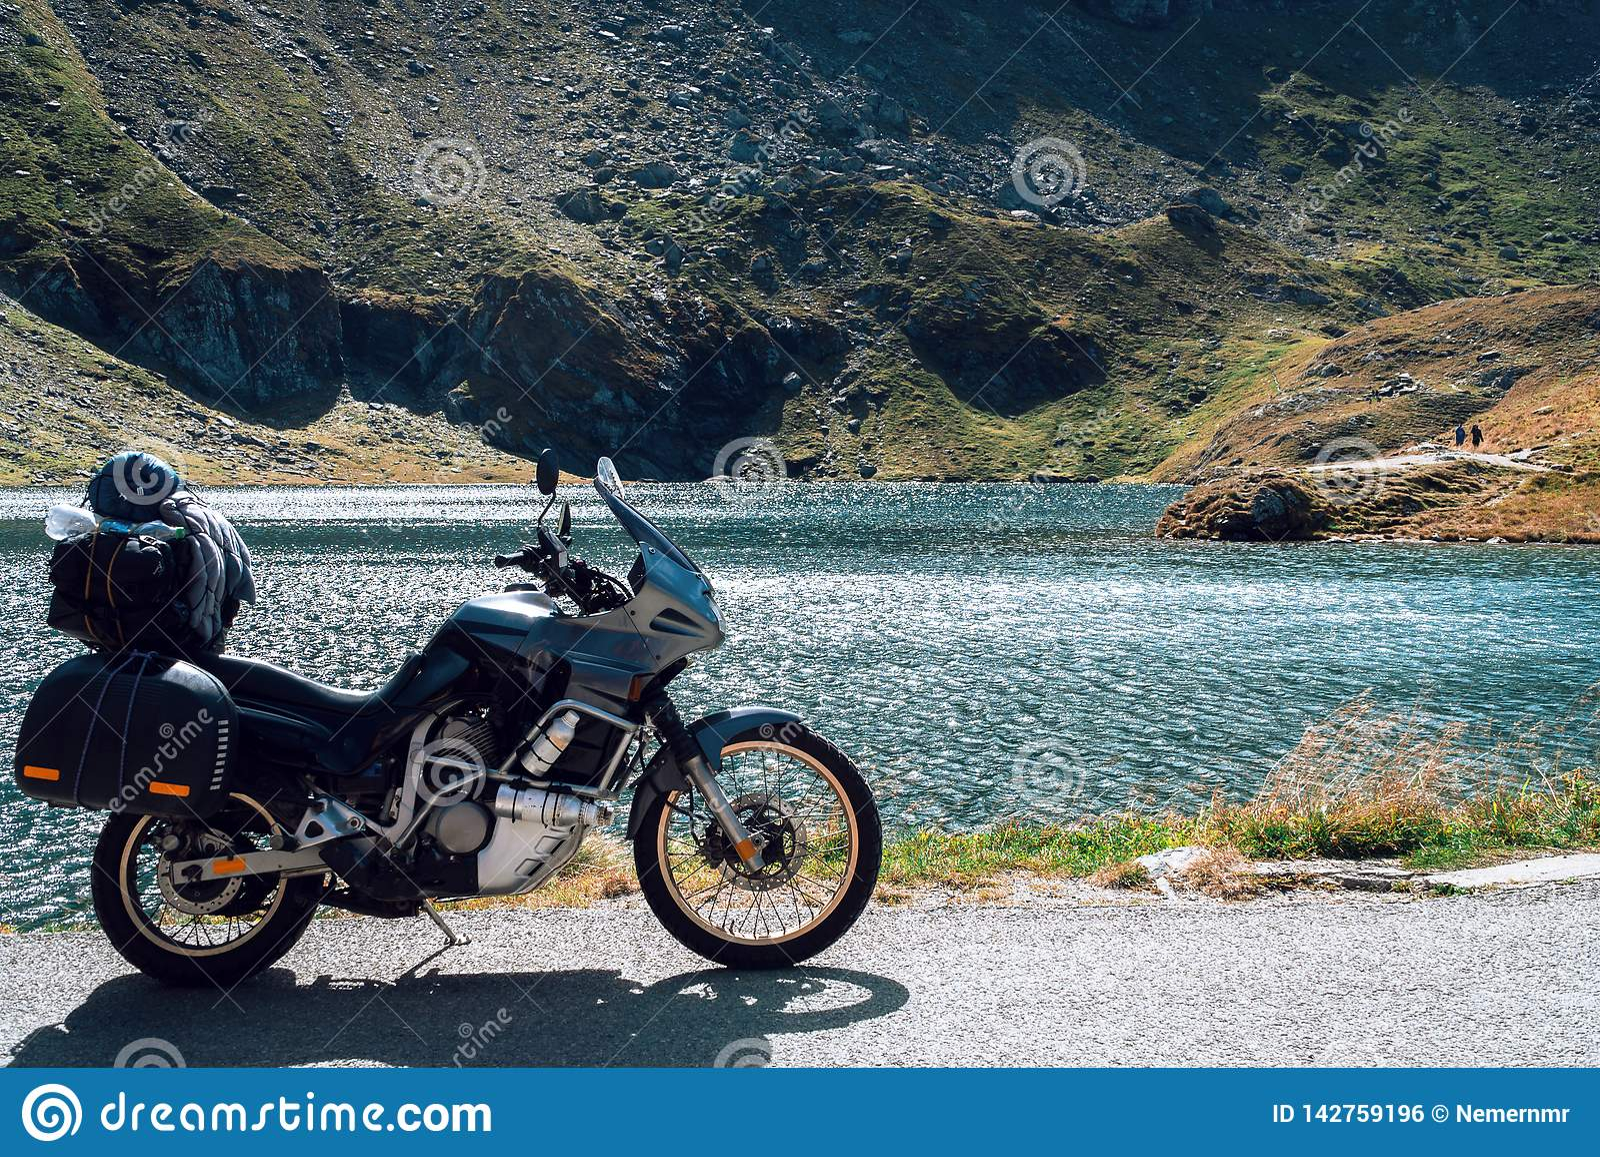 Мотоцикл приключения в горах осени Румынии Туризм Moto и образ жизни путешественников moto пока путешествующ Европа Озеро